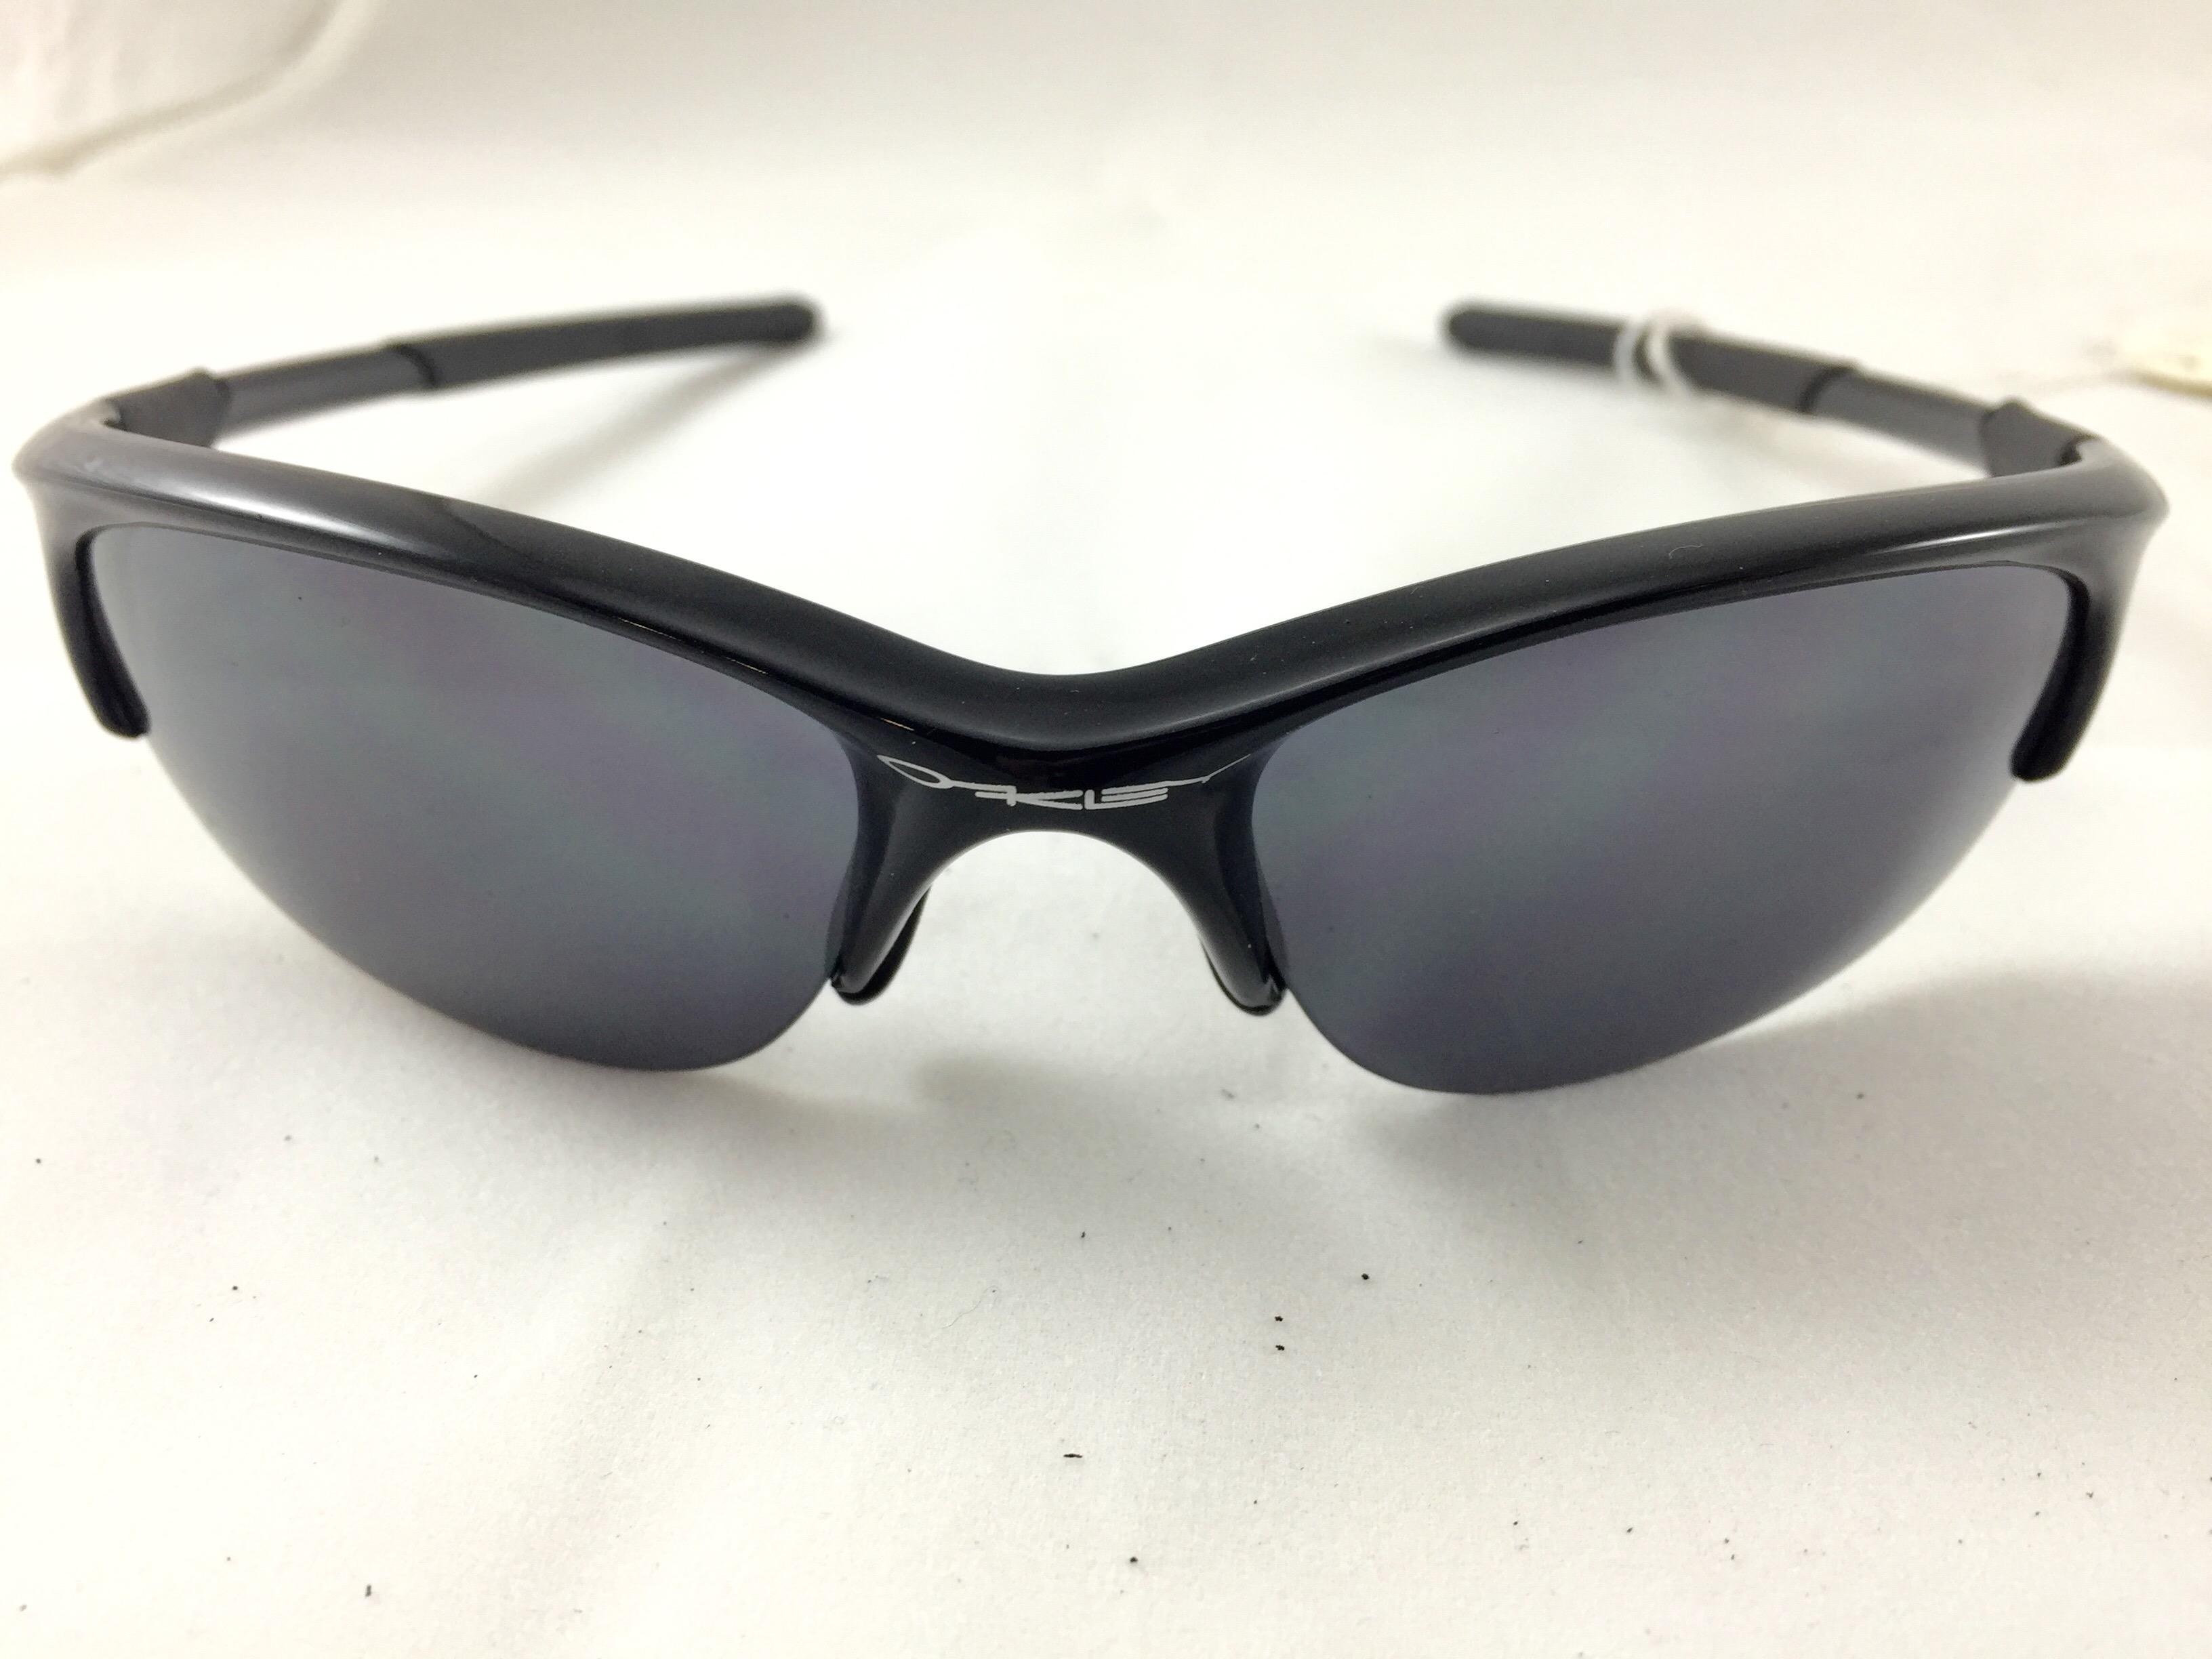 6361381e9e Oakley Half Jacket Jet Black With Black Iridium Lens 03 614 ...